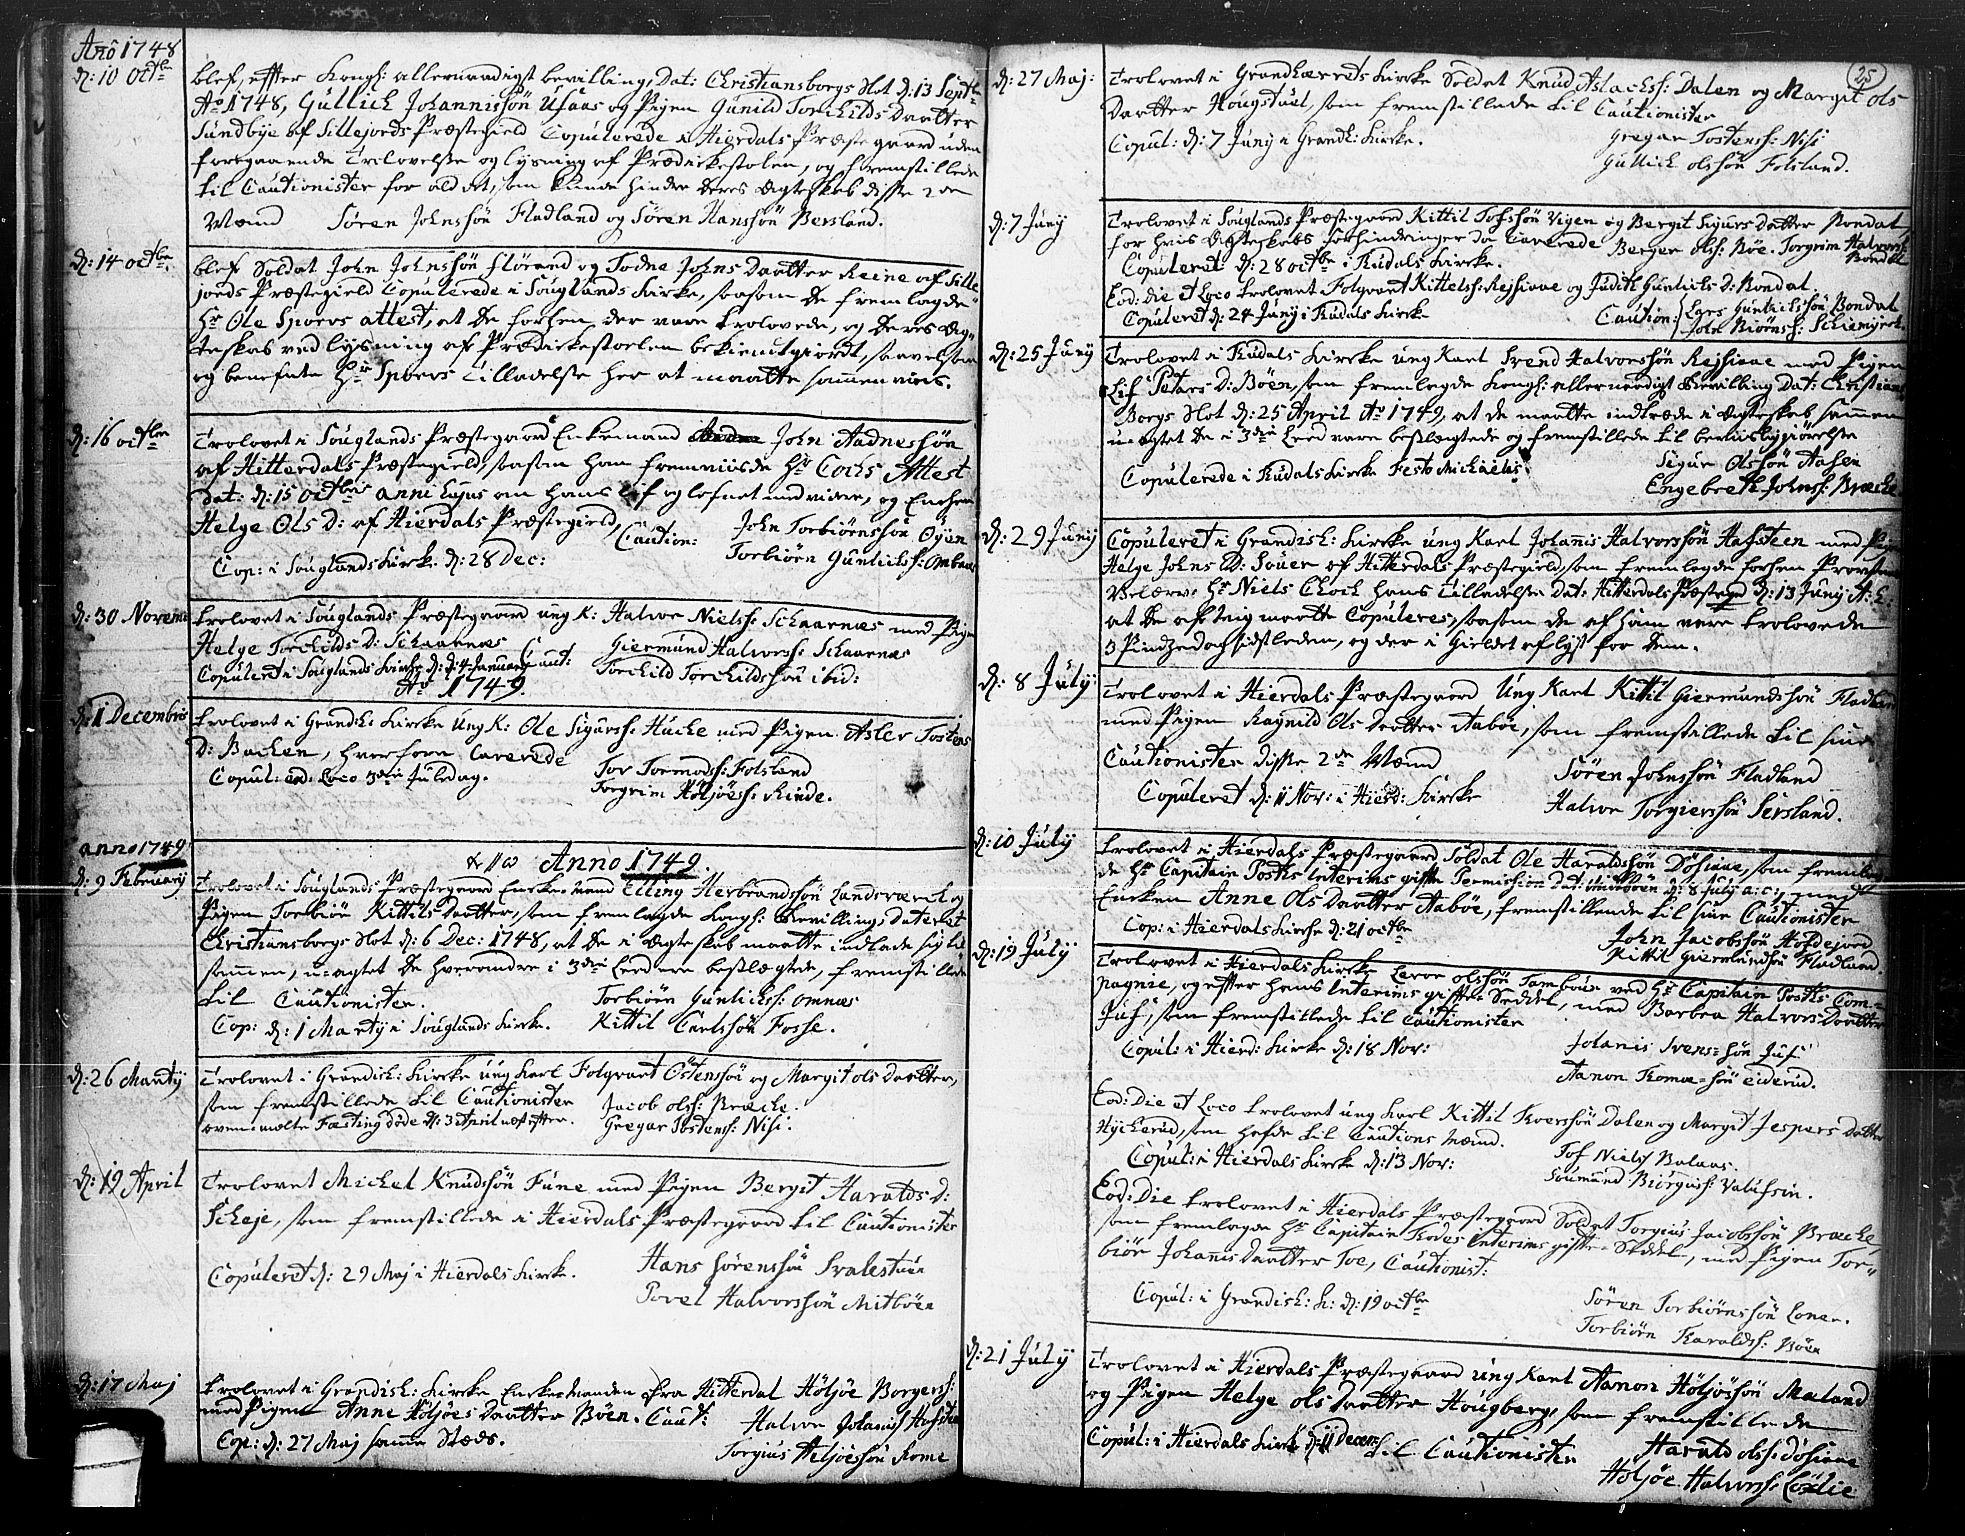 SAKO, Hjartdal kirkebøker, F/Fa/L0004: Ministerialbok nr. I 4, 1727-1795, s. 25